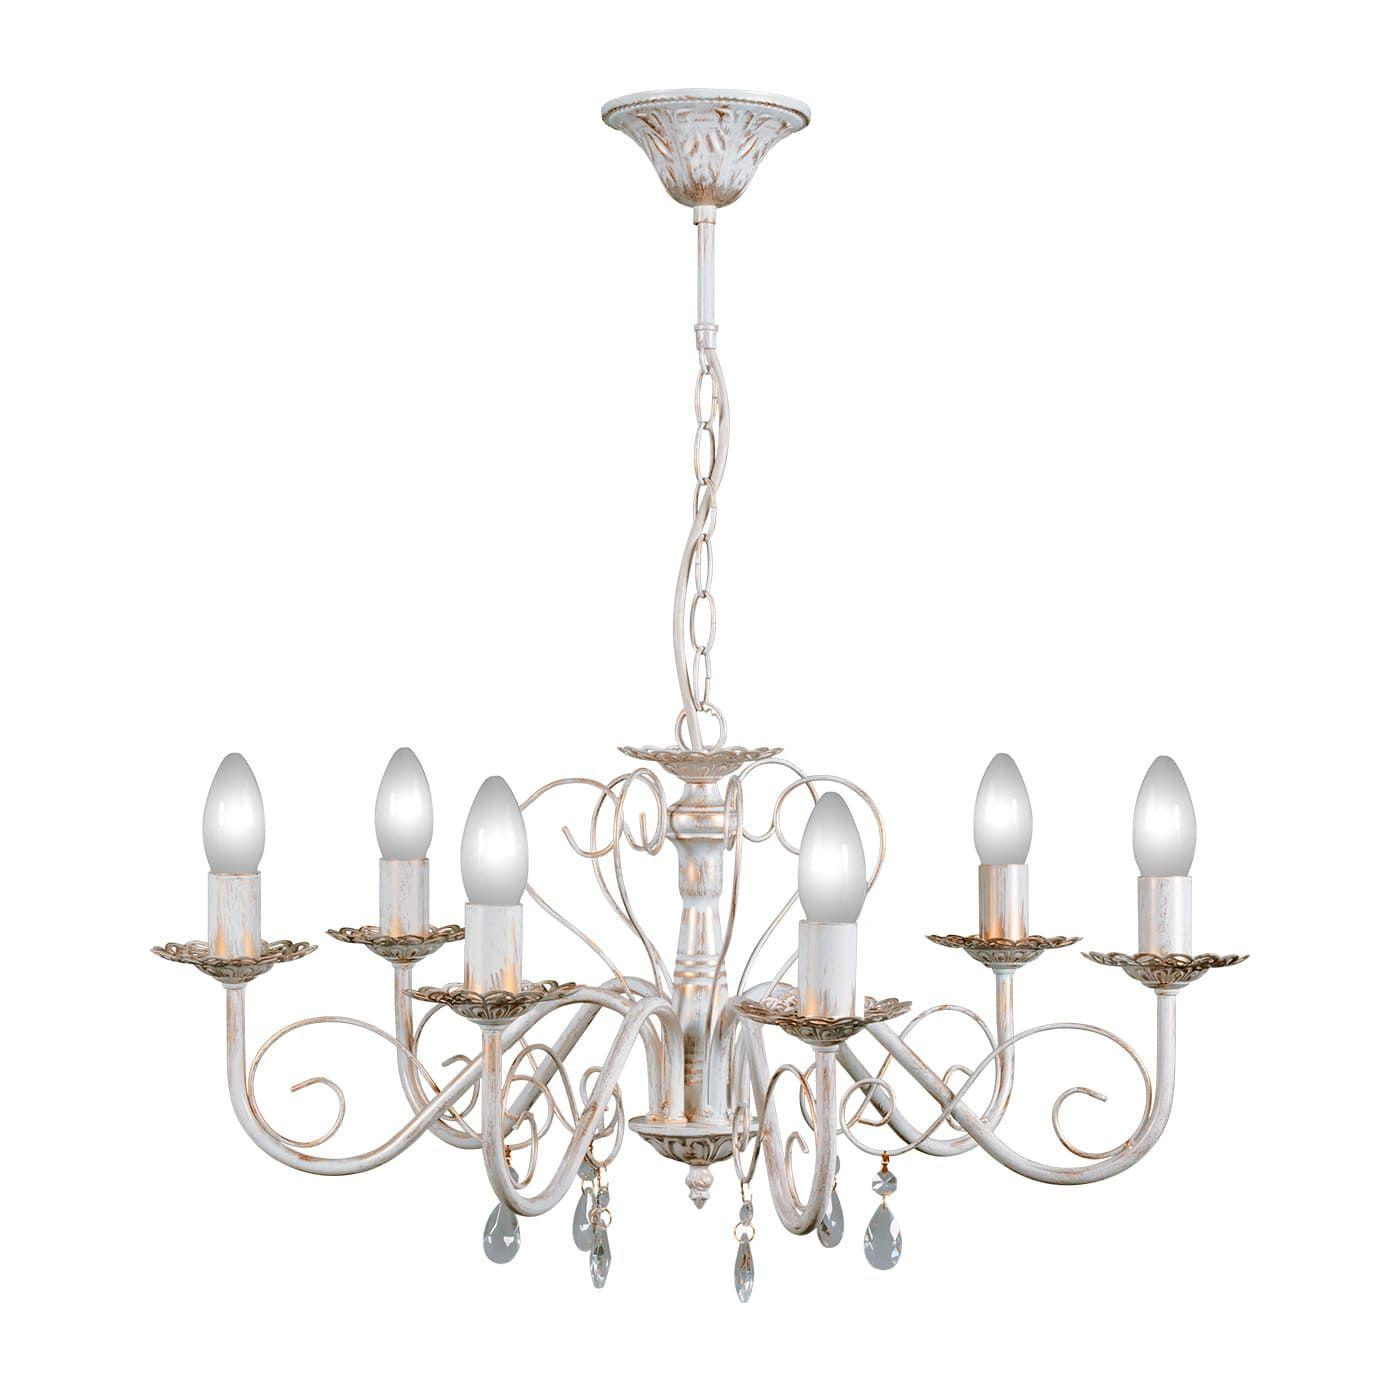 PETRASVET / Pendant chandelier S1023-6, 6xE14 max. 60W